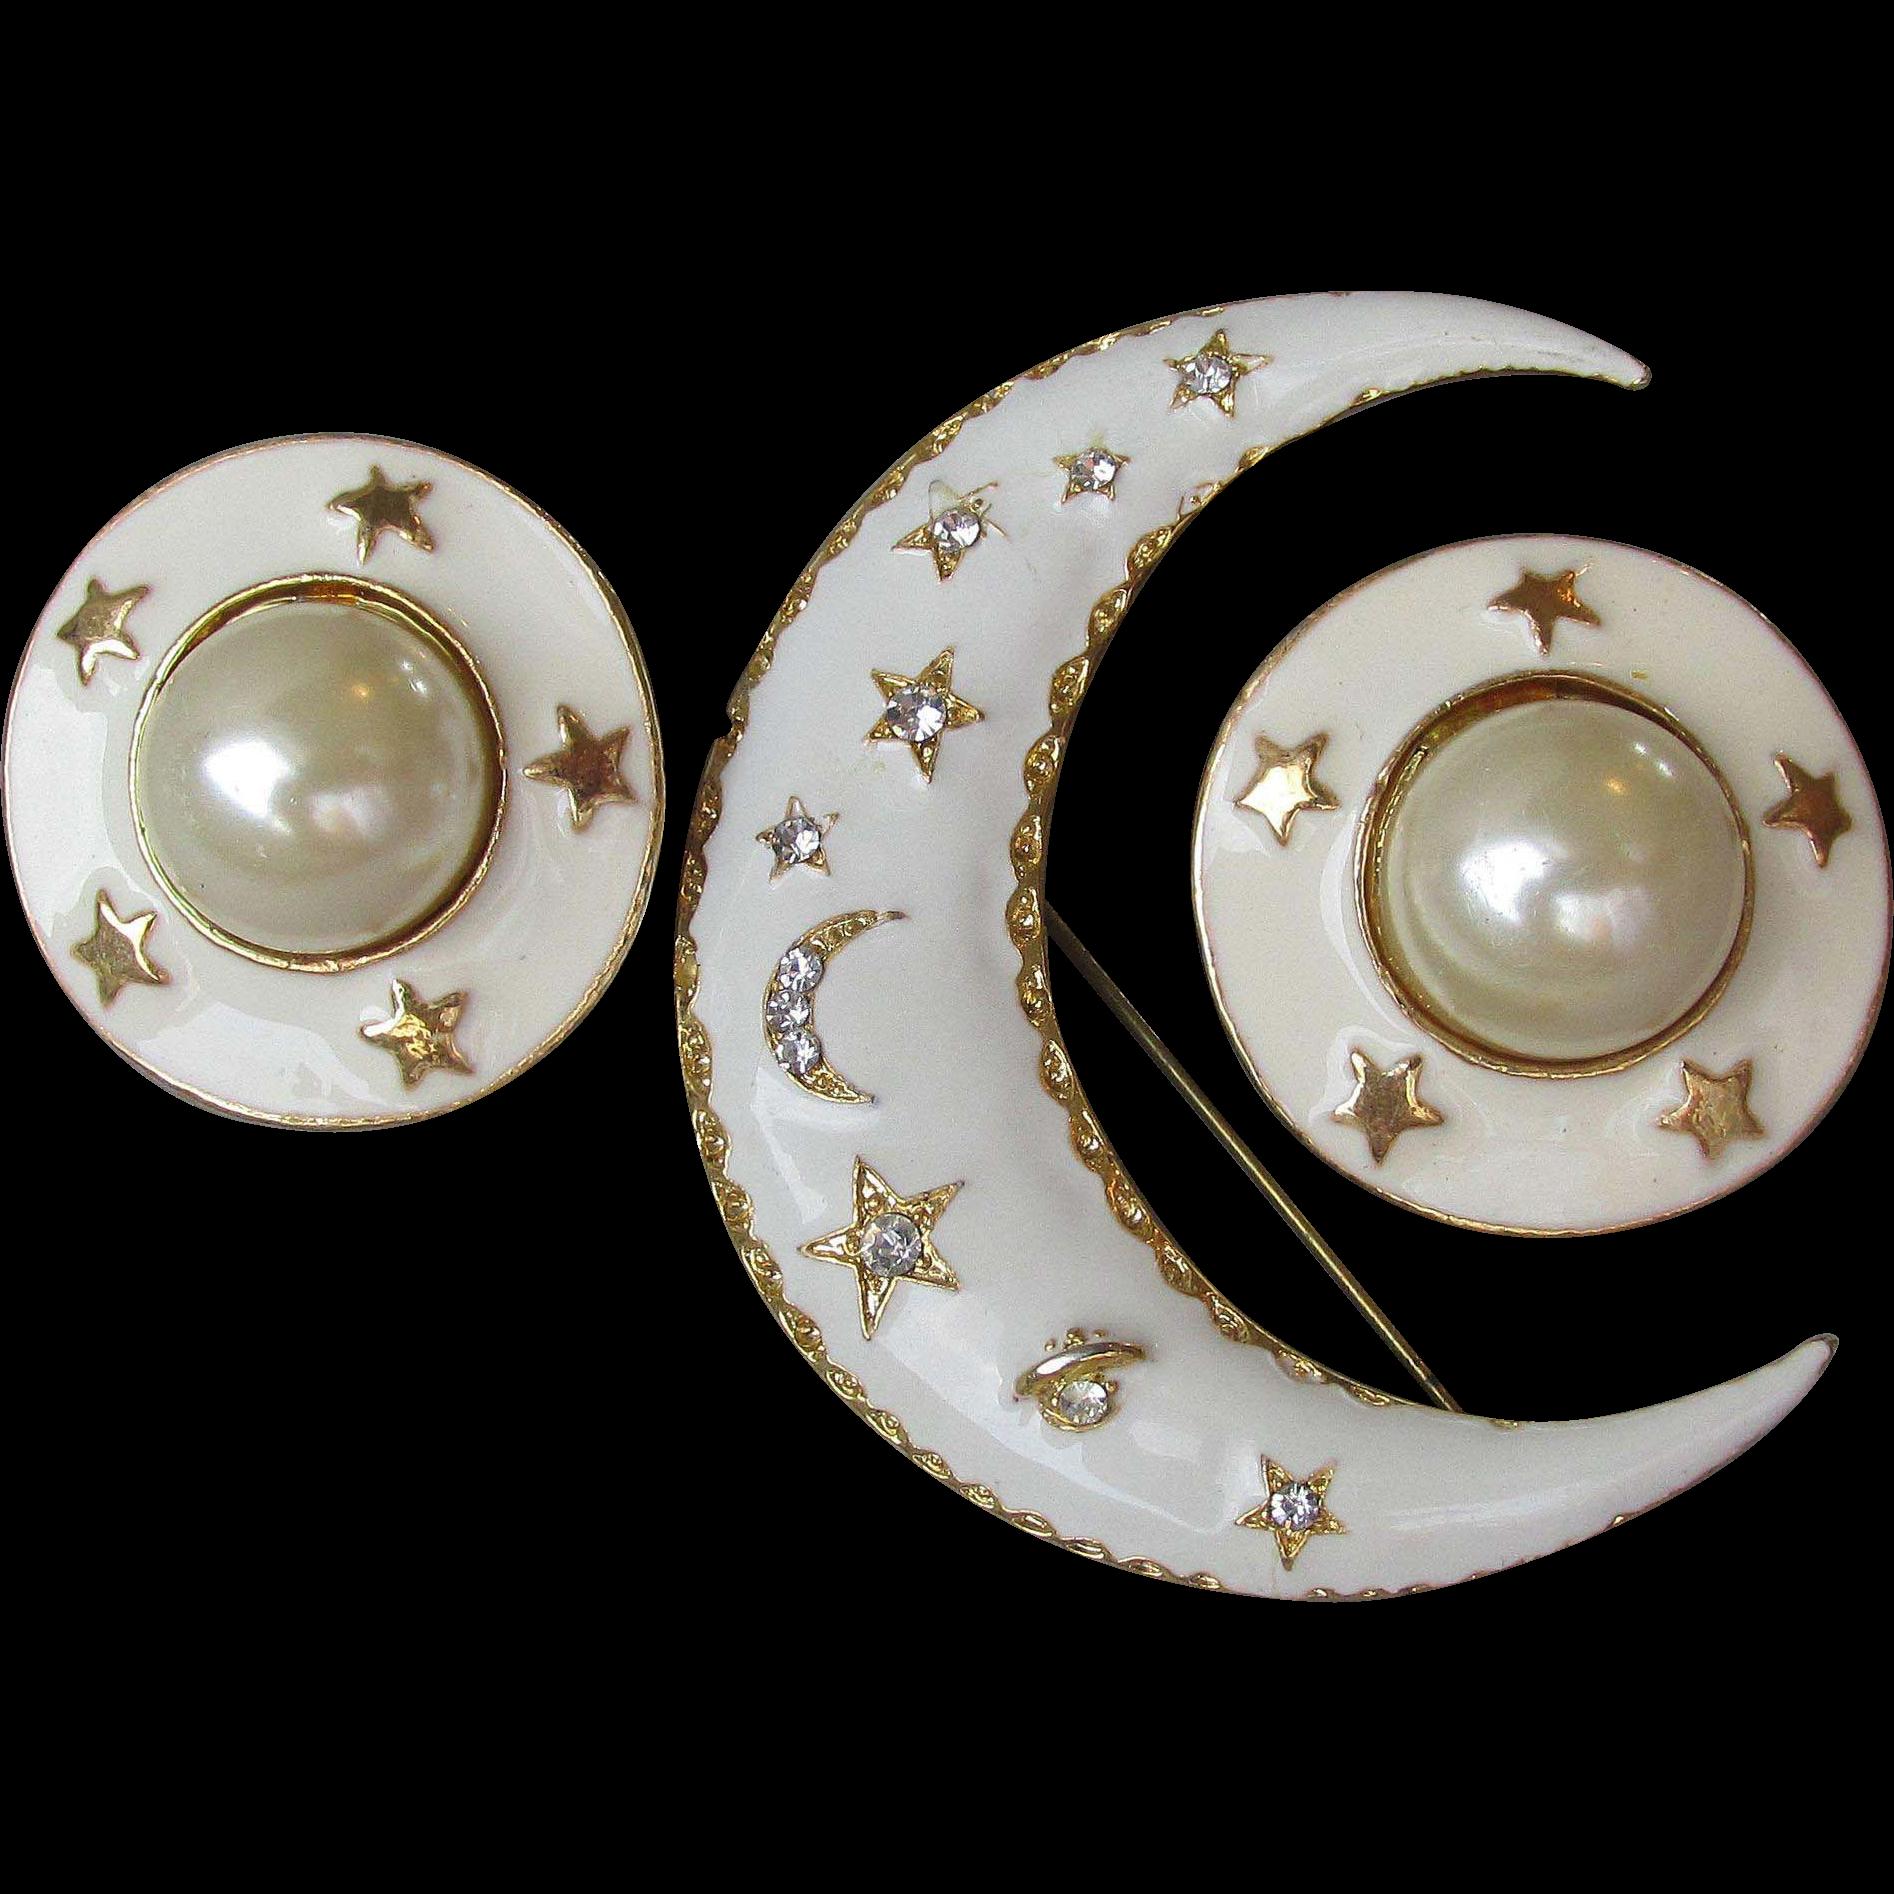 Vintage 1980's Ivory Enamel on Gold Tone Moon & Stars Pin, Earrings Set